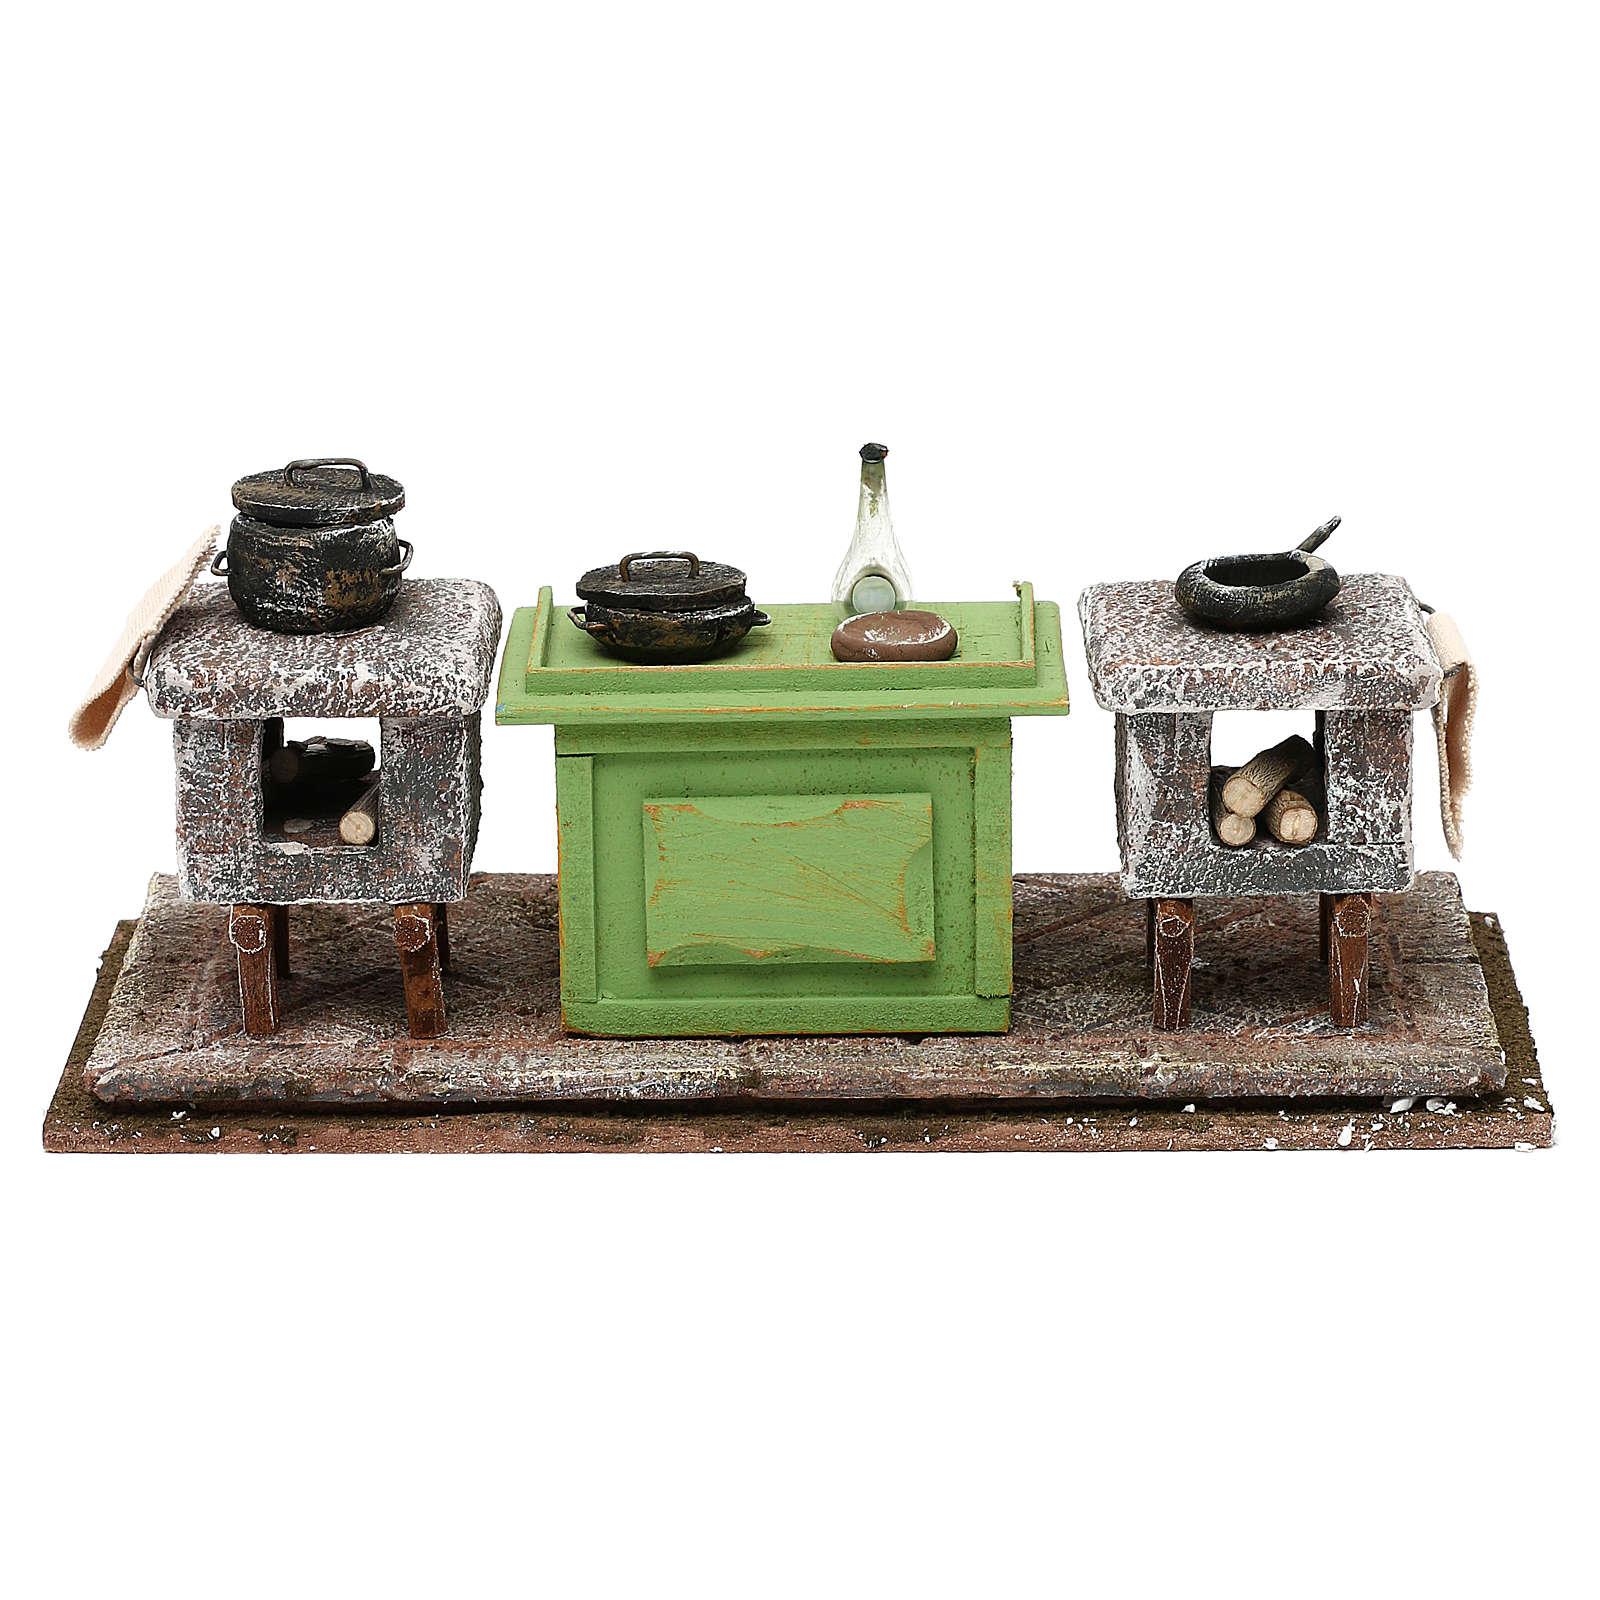 Cucina con banco e pentole 10x25x10 cm presepe 12 cm 4